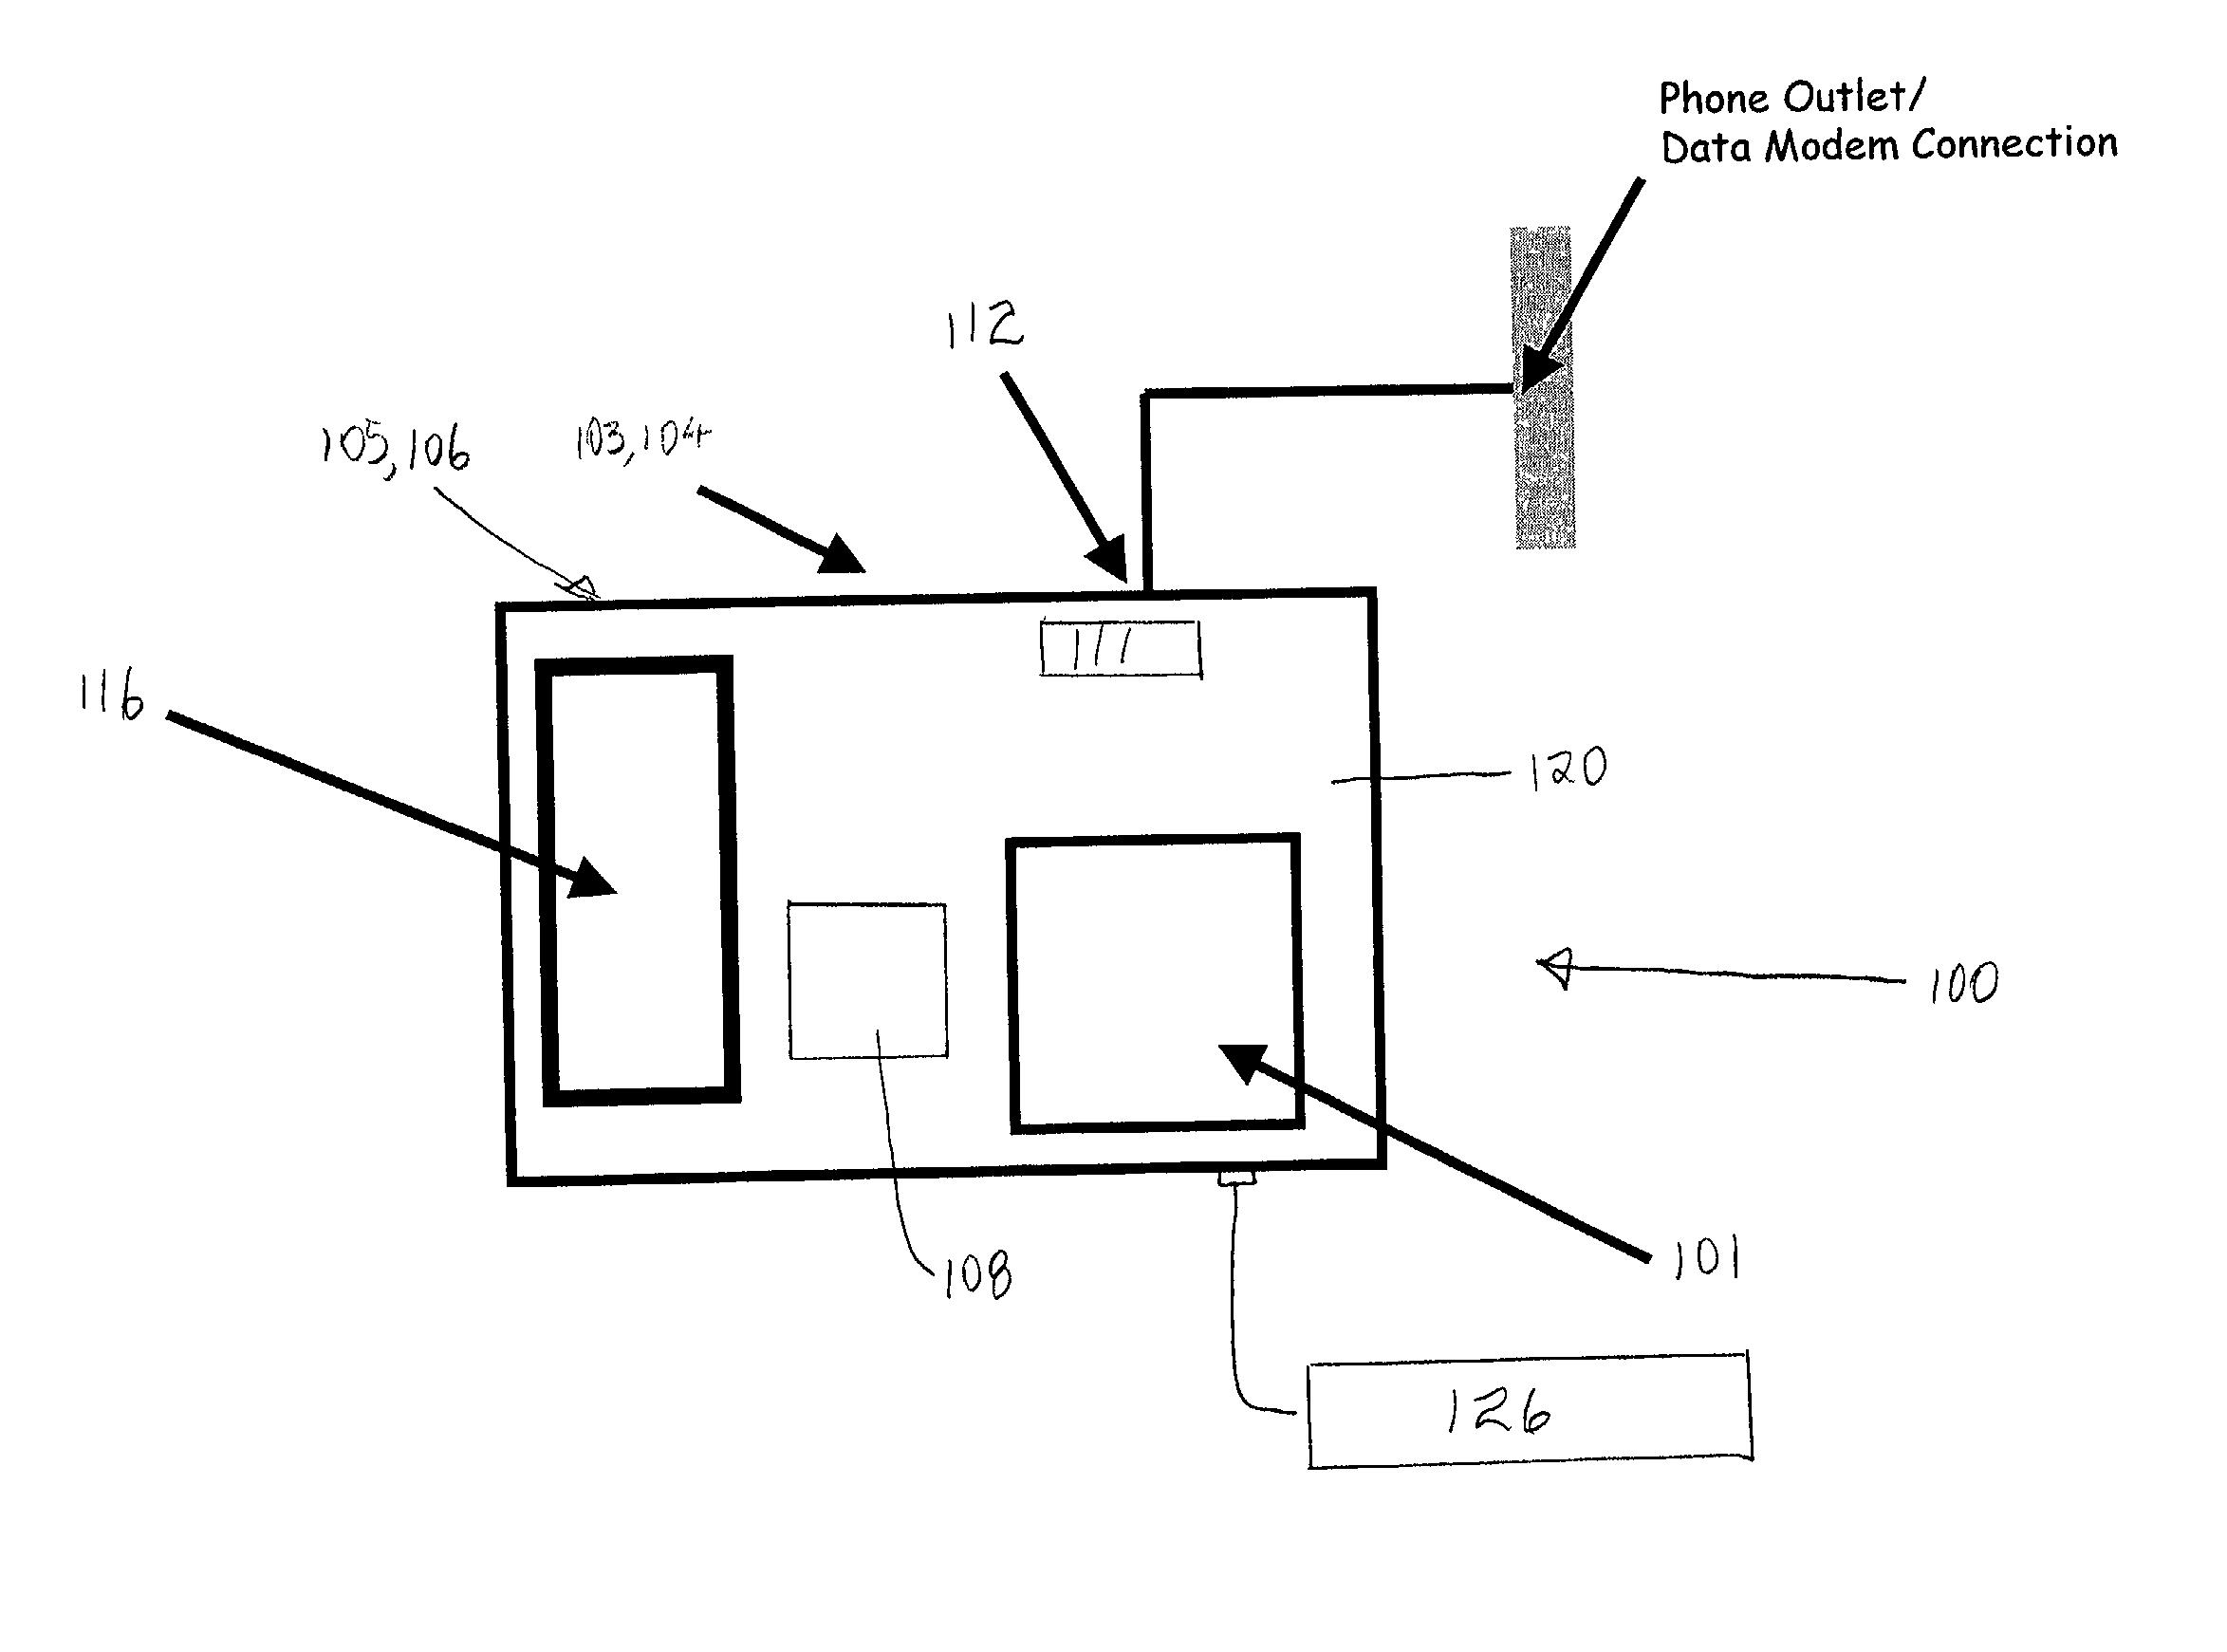 Dial Telephone Wiring Diagram